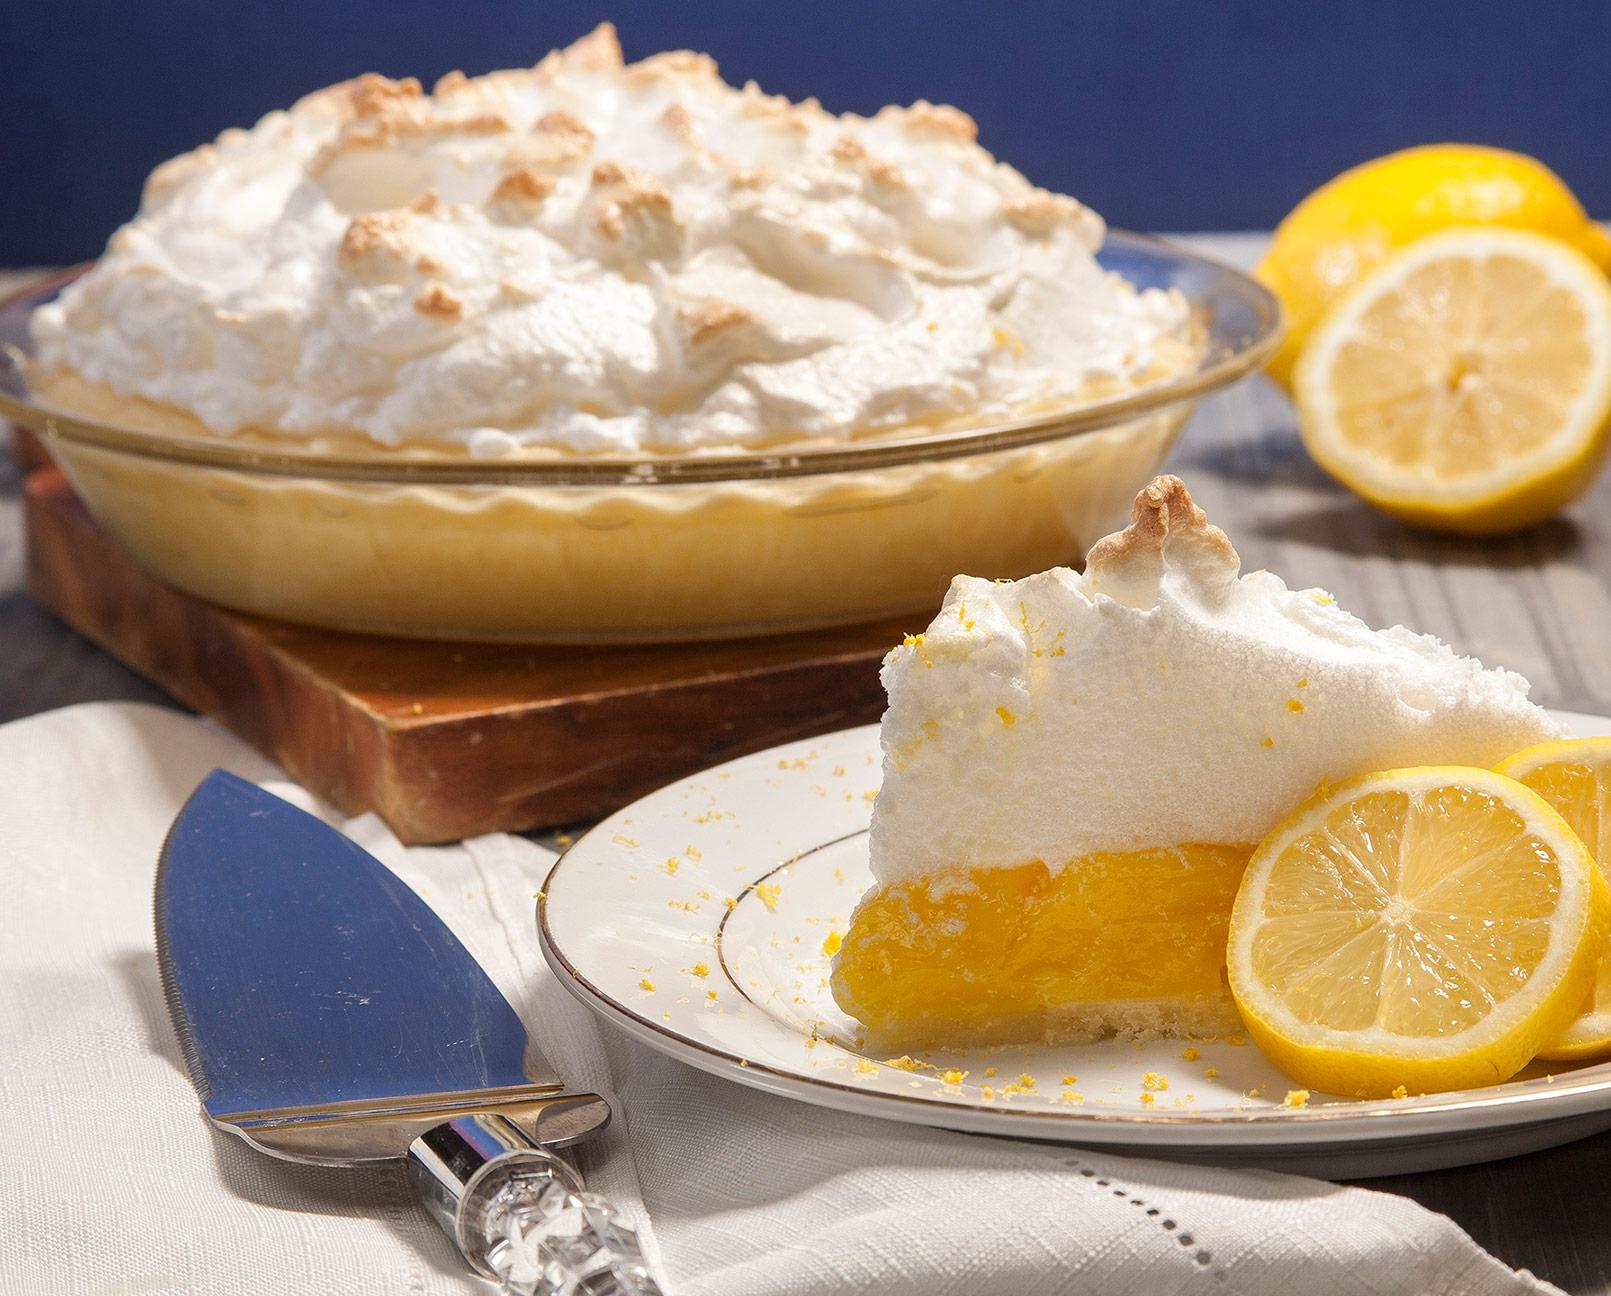 Gluten-Free Lemon Meringue Pie